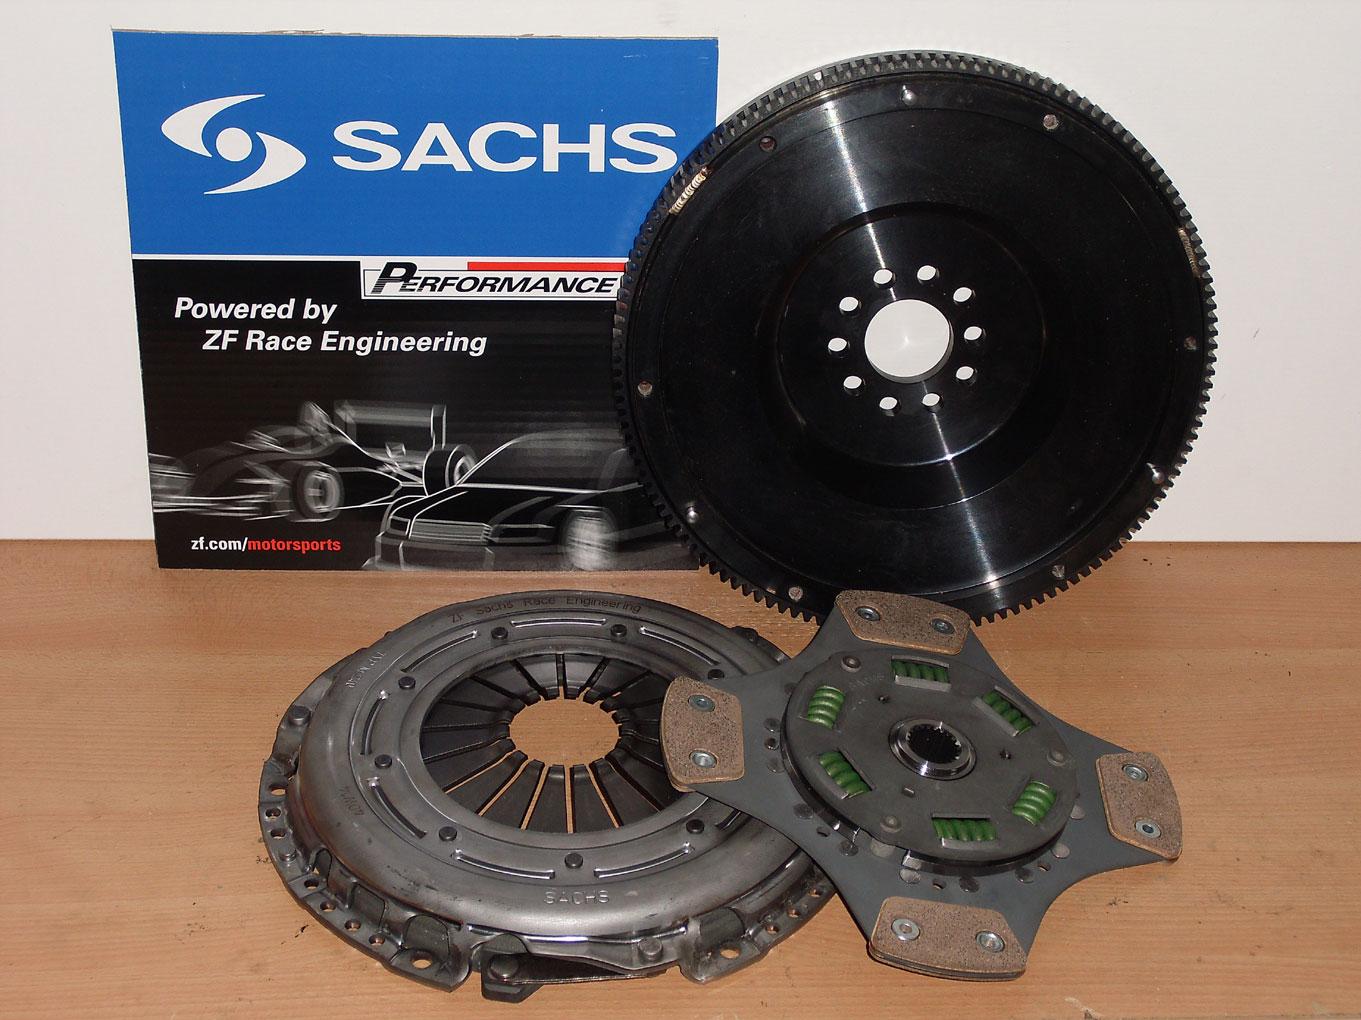 clutch kit reinforced flywheel lightweight VW Golf mk5 R32 3 2 1K V6 VR6  R32 4Motion Audi A3 3 2 V6 8P Audi TT 3 2 V6 8J Quattro 600NM 680NM 750NM